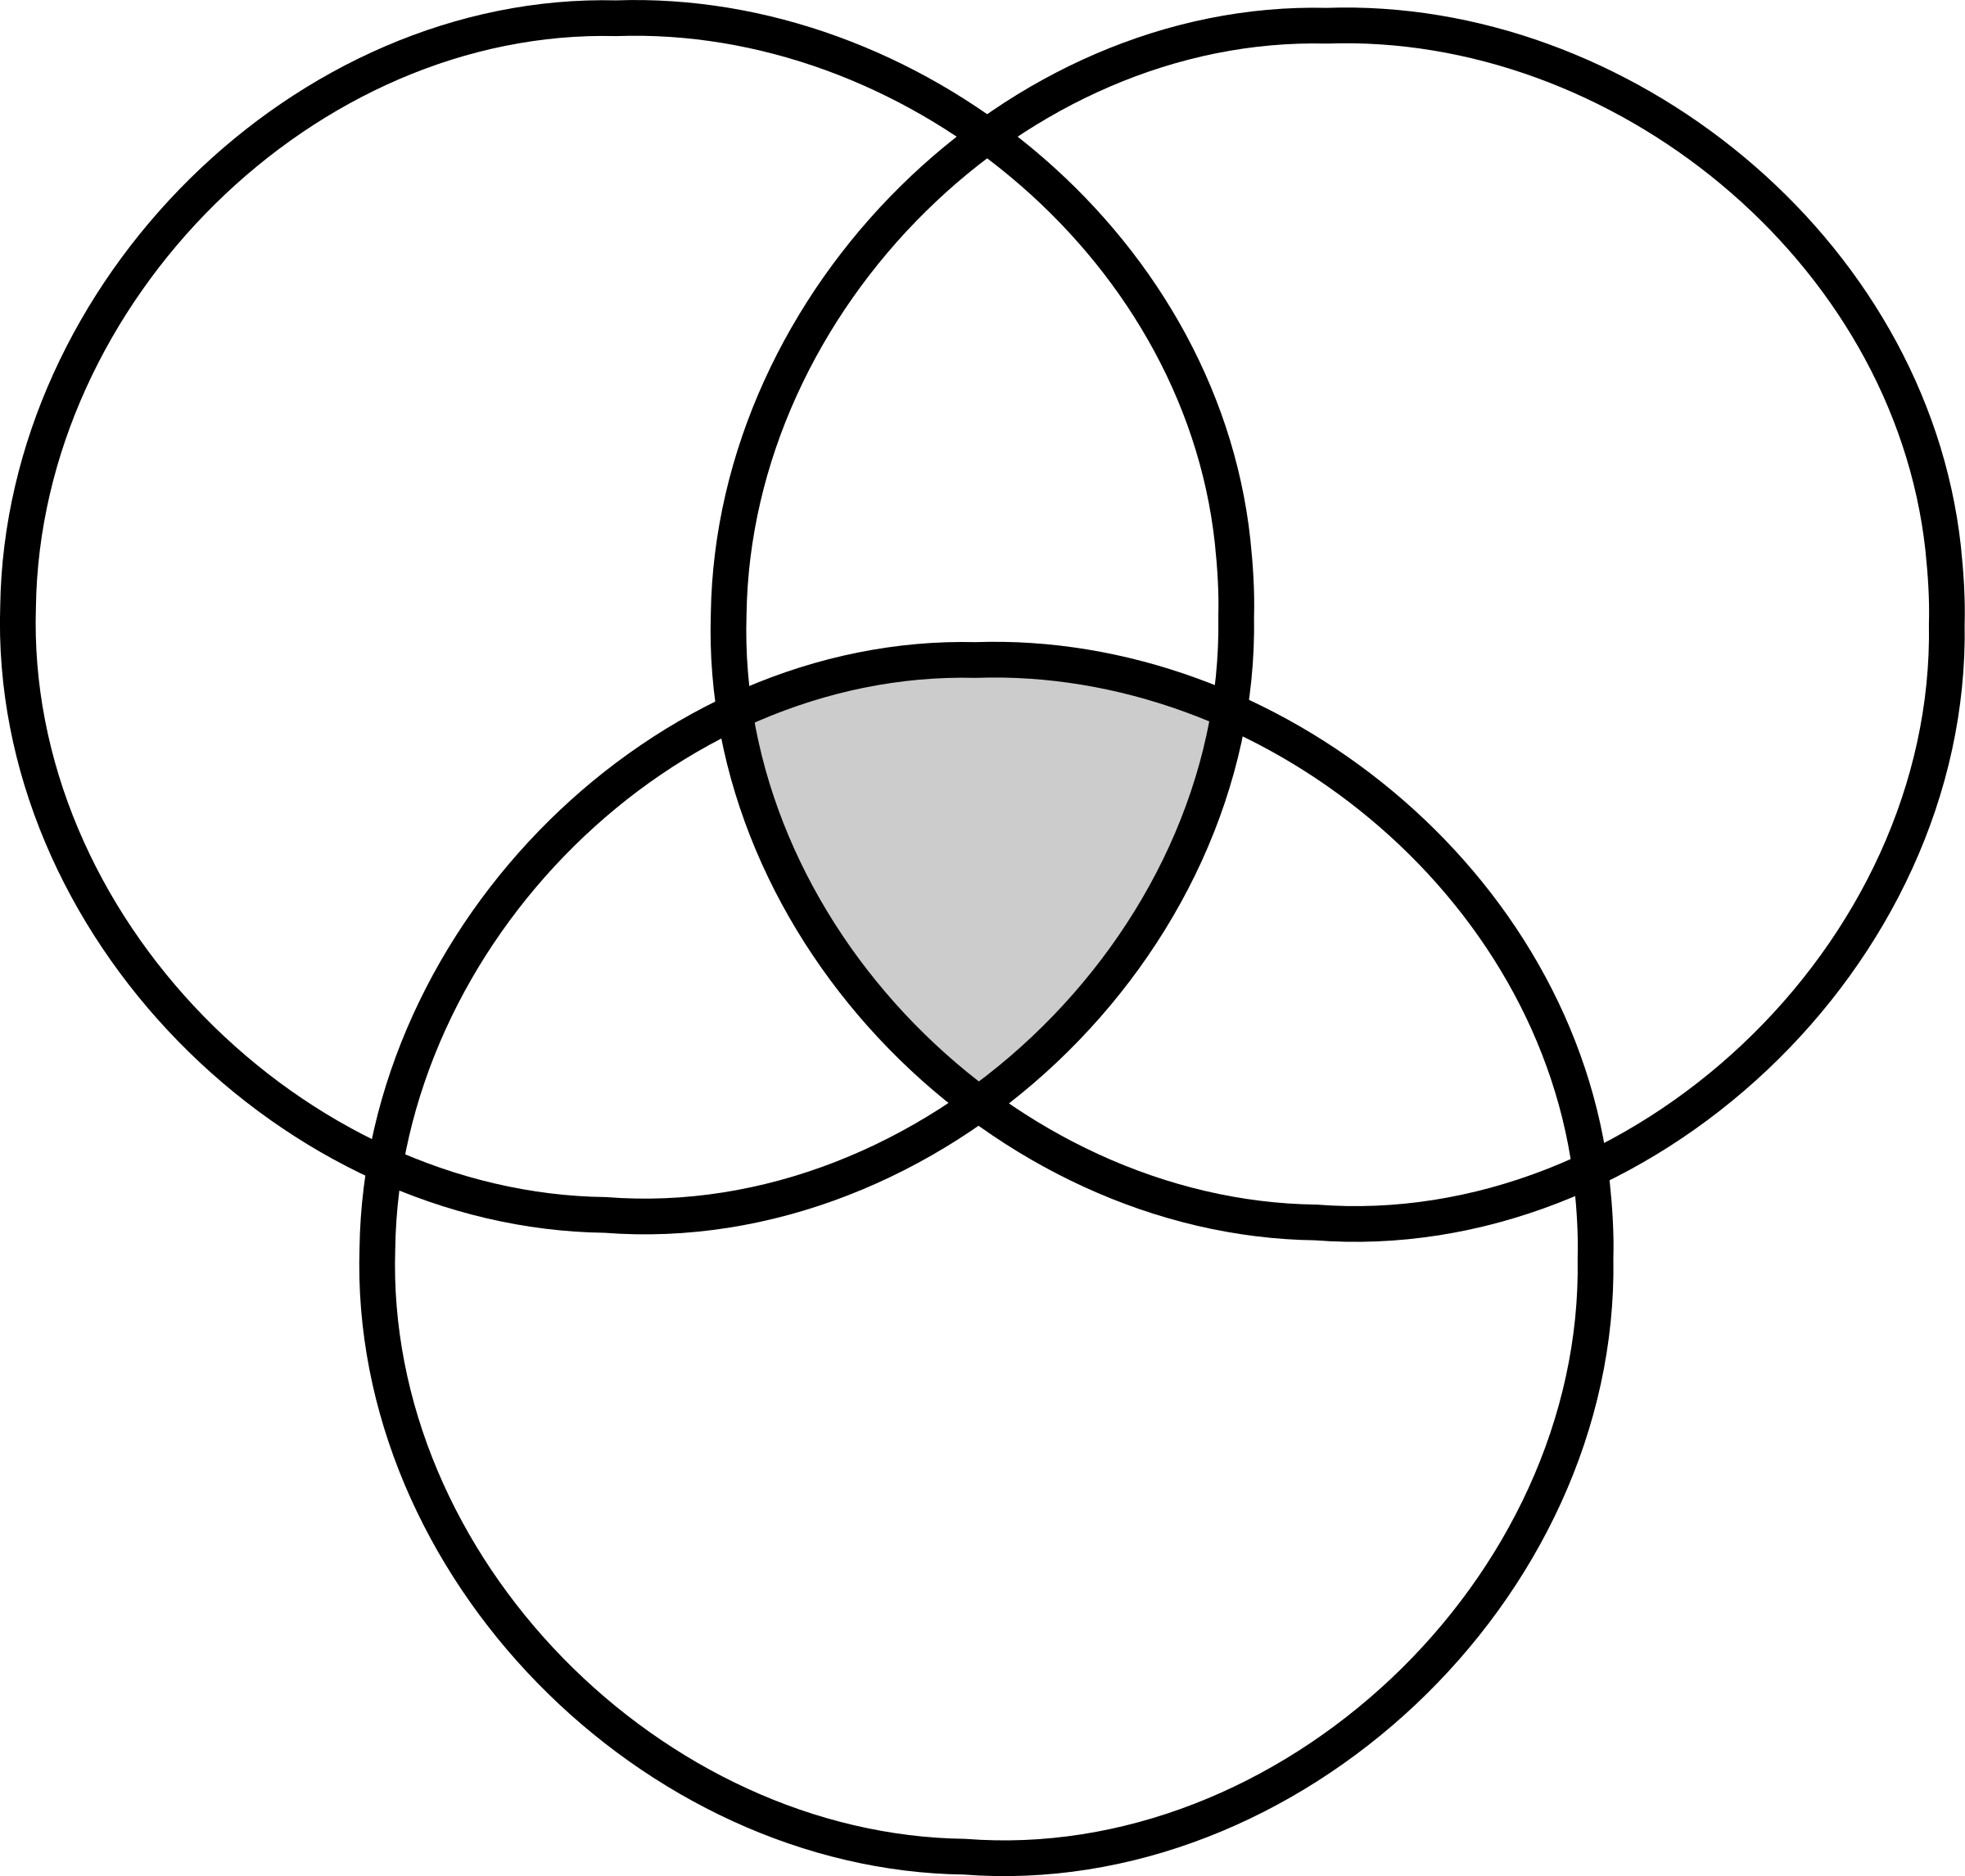 Clipart diagramme de venn venn diagram diagramme de venn venn diagram pooptronica